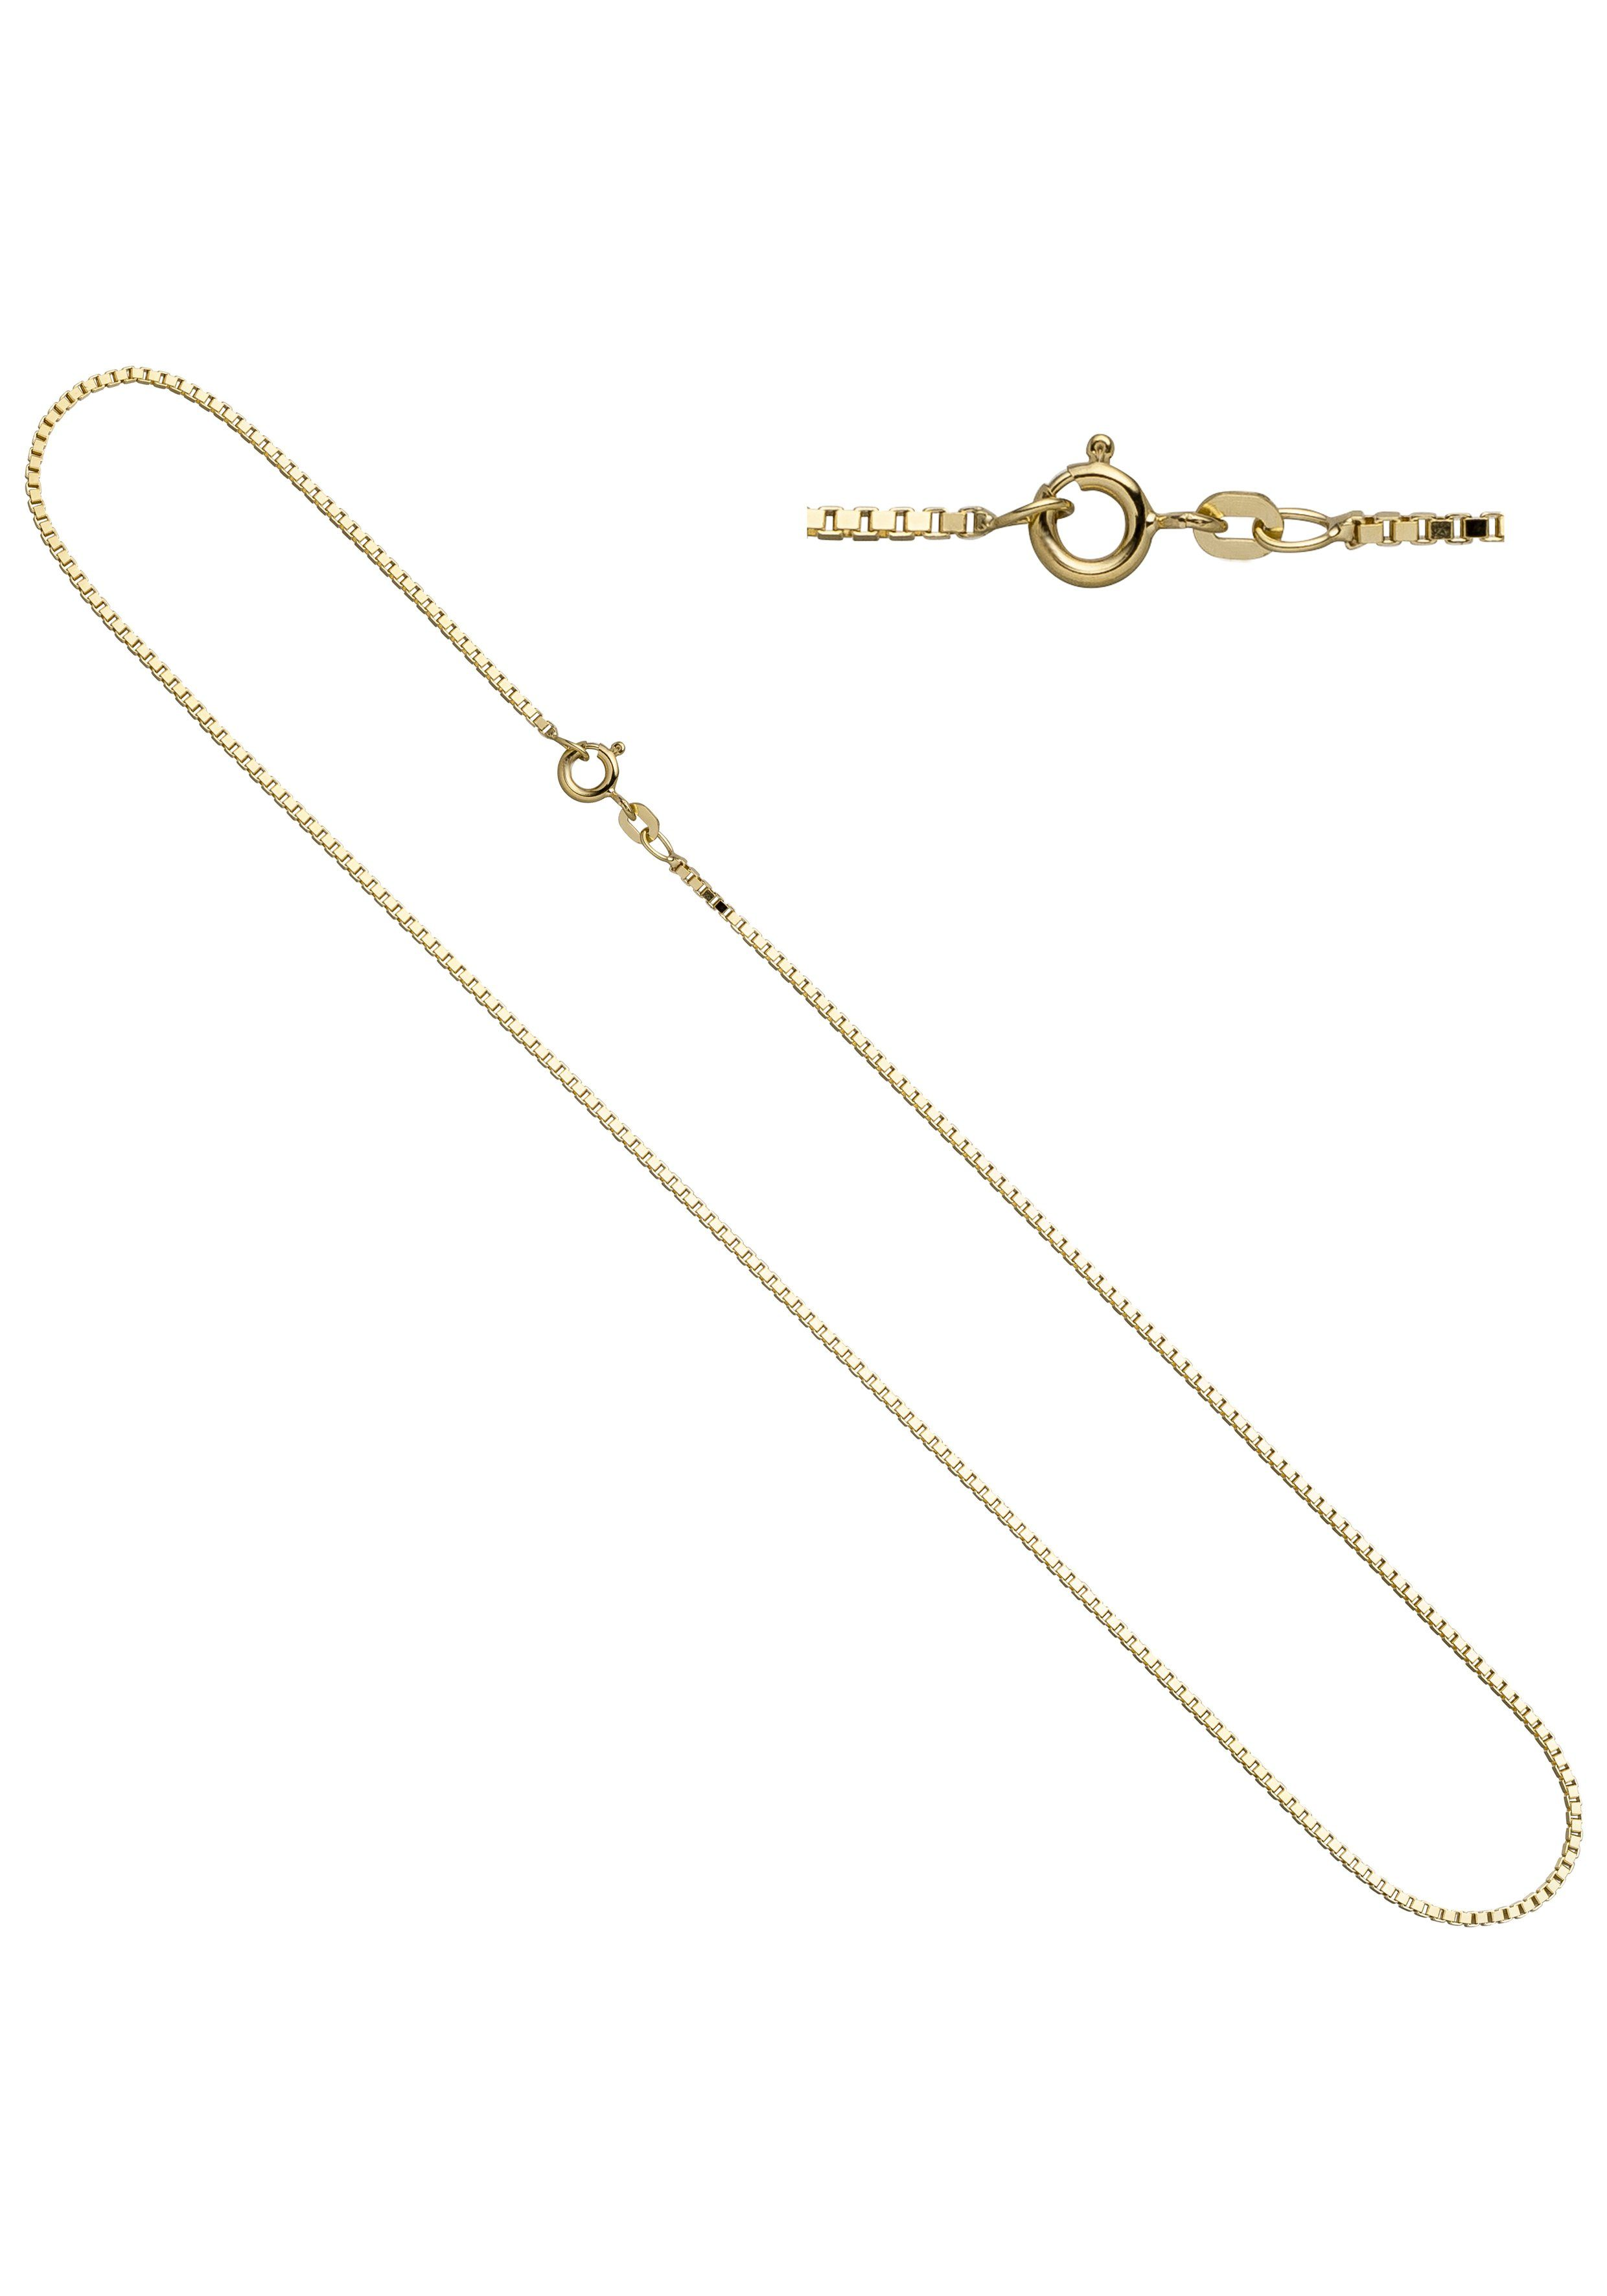 JOBO Goldkette Venezianerkette 333 Gold 38 cm 1,0 mm